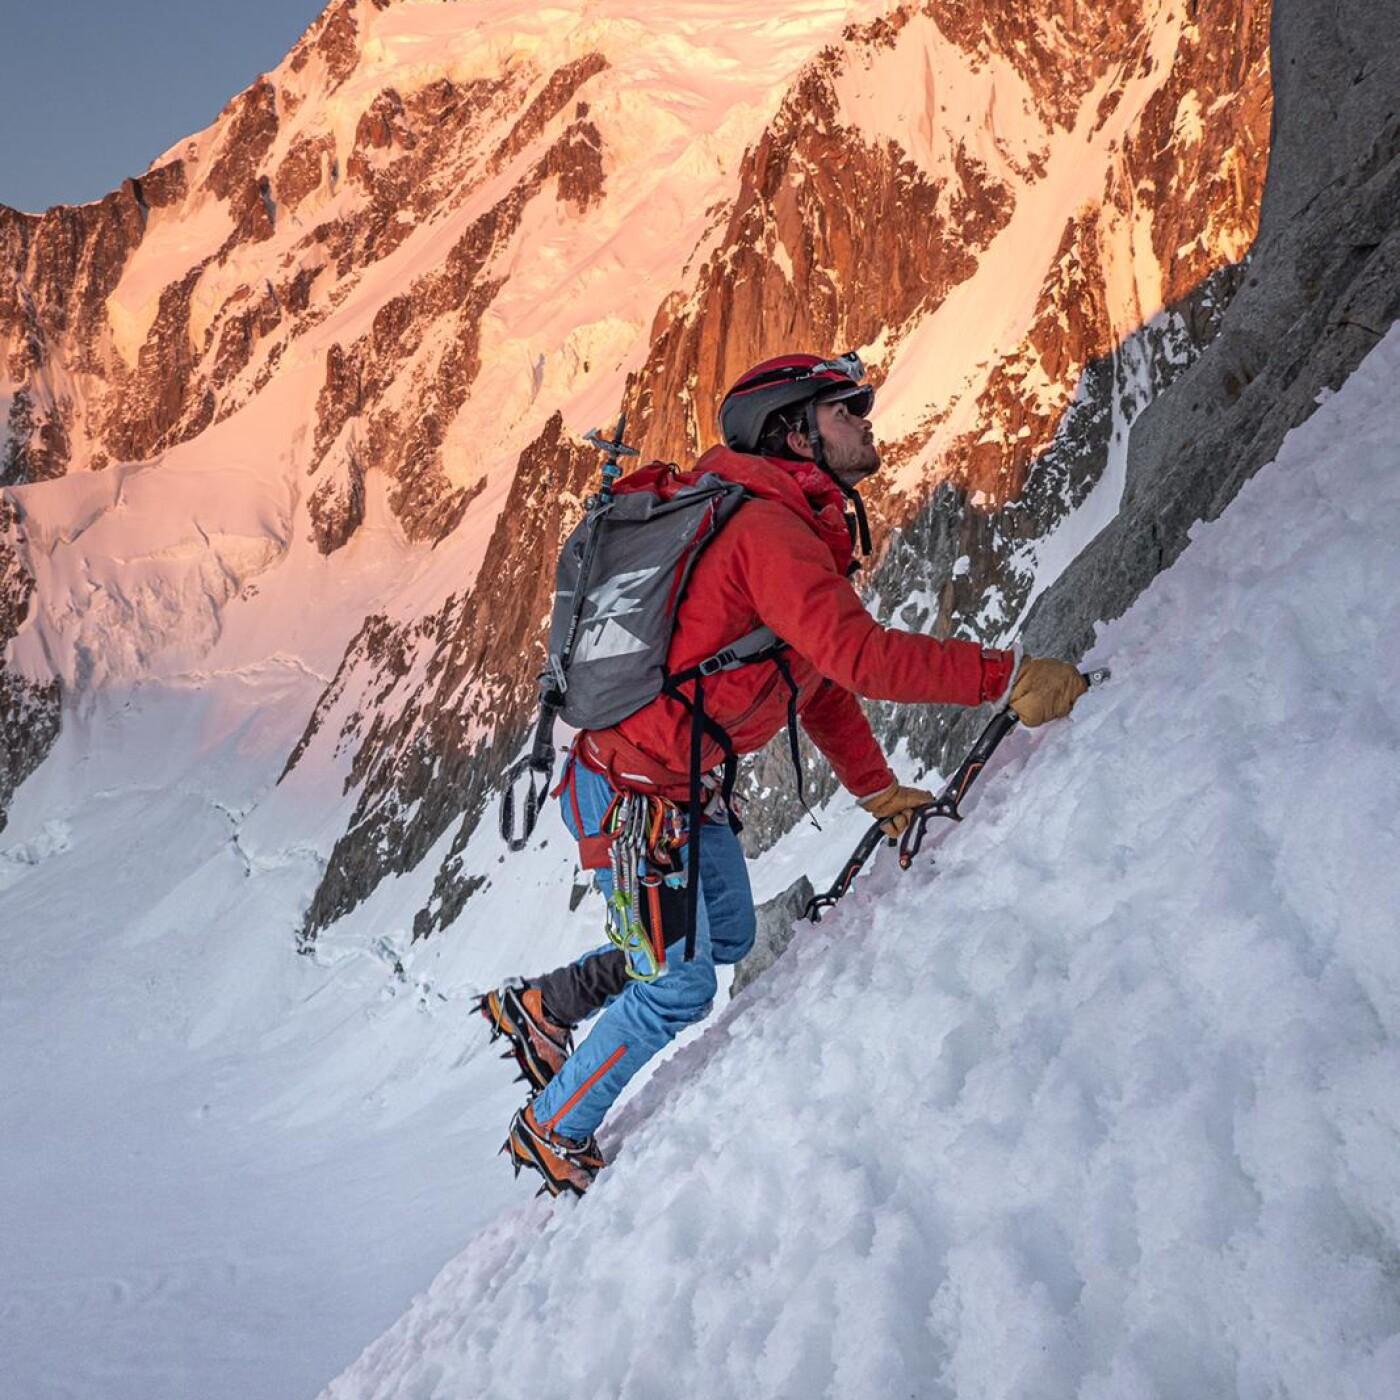 Nicolas Thellier 03 - préparation d'une course d'alpinisme - Globe Trotter Avril 2021 - StereoChic Radio